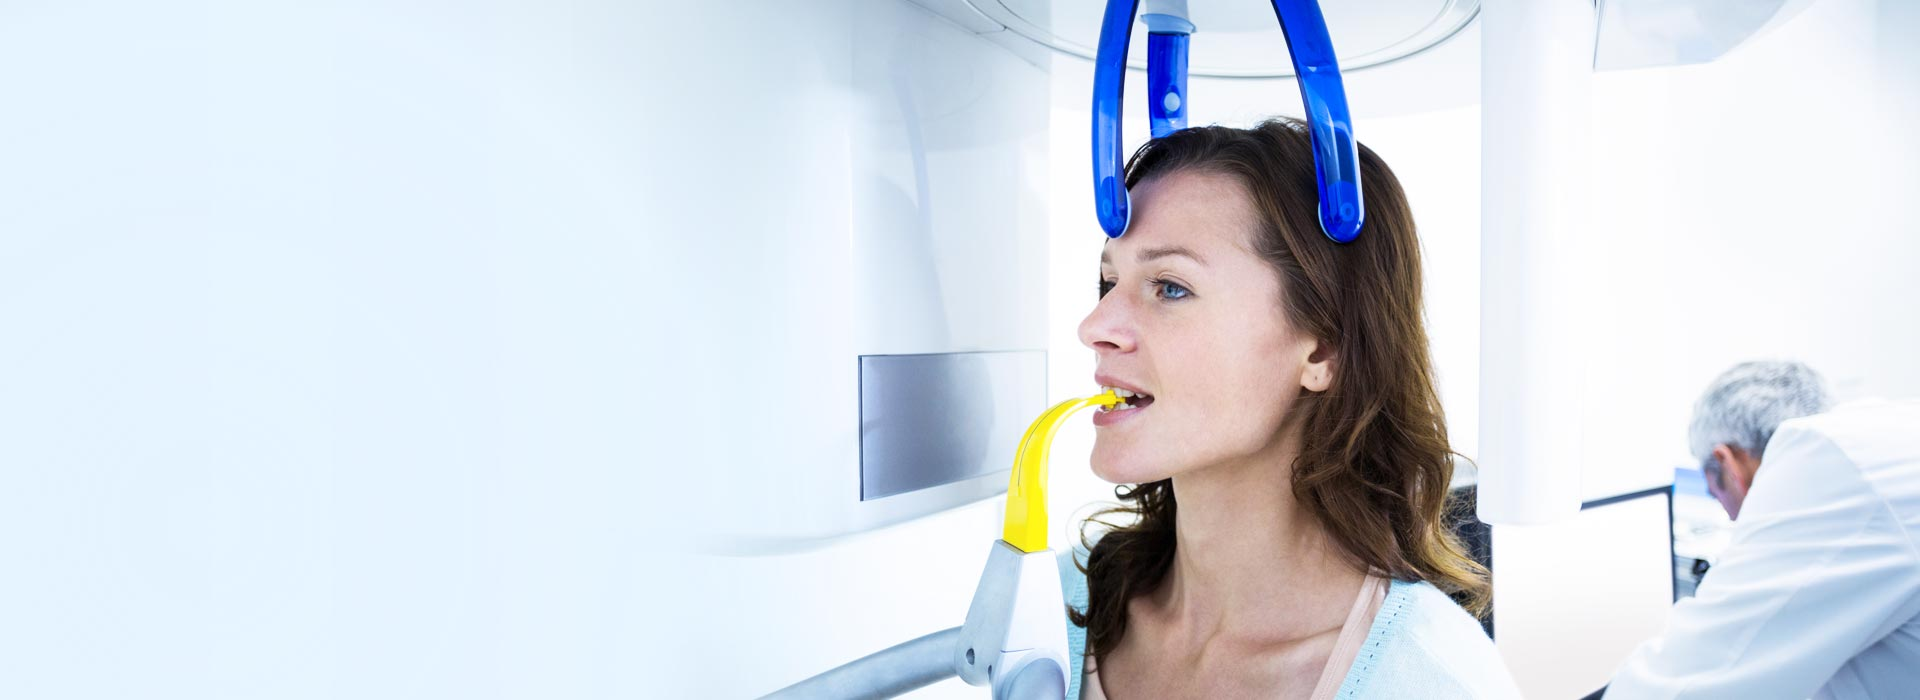 A woman is having dental x-ray